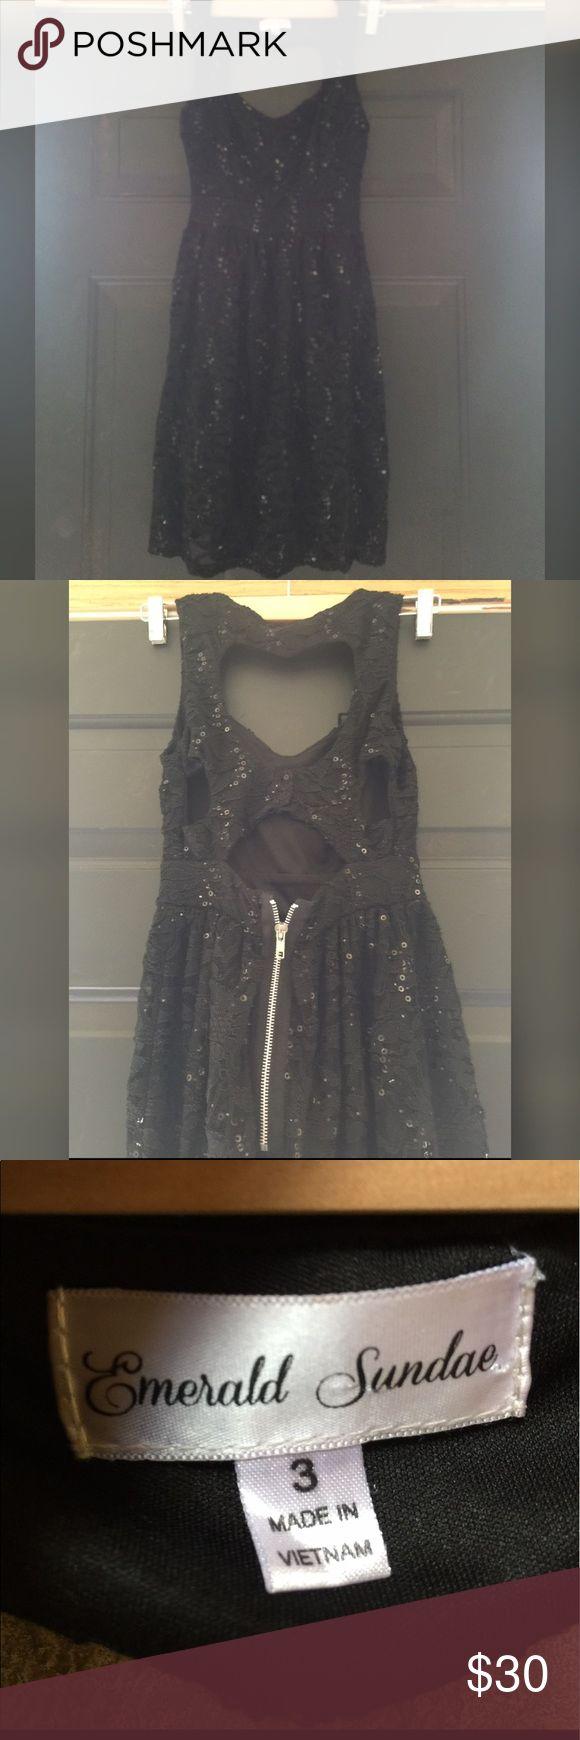 best images about my posh closet on pinterest cutout dress